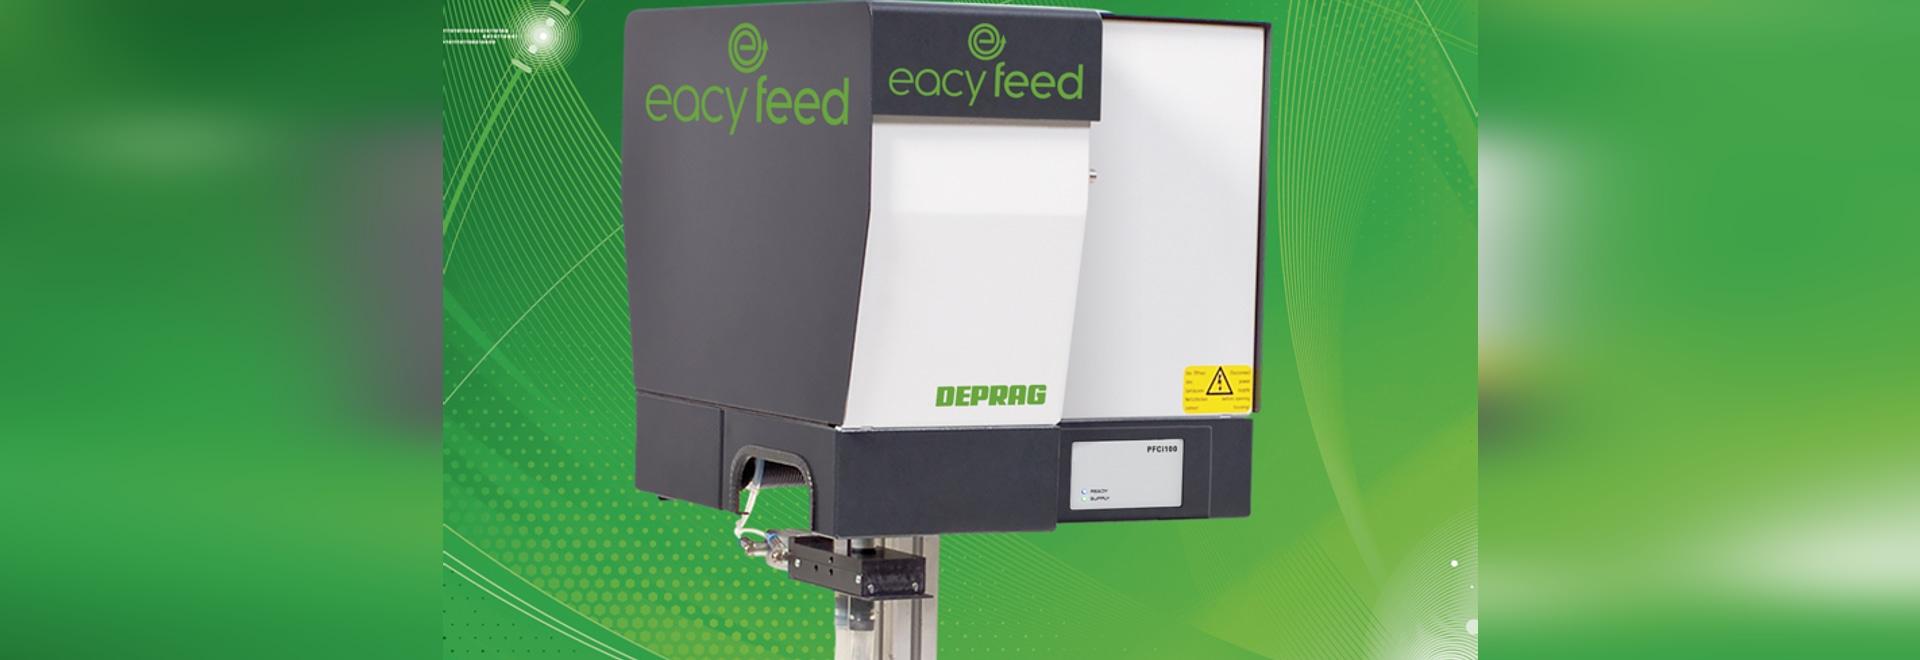 Intelligent and efficient feeding